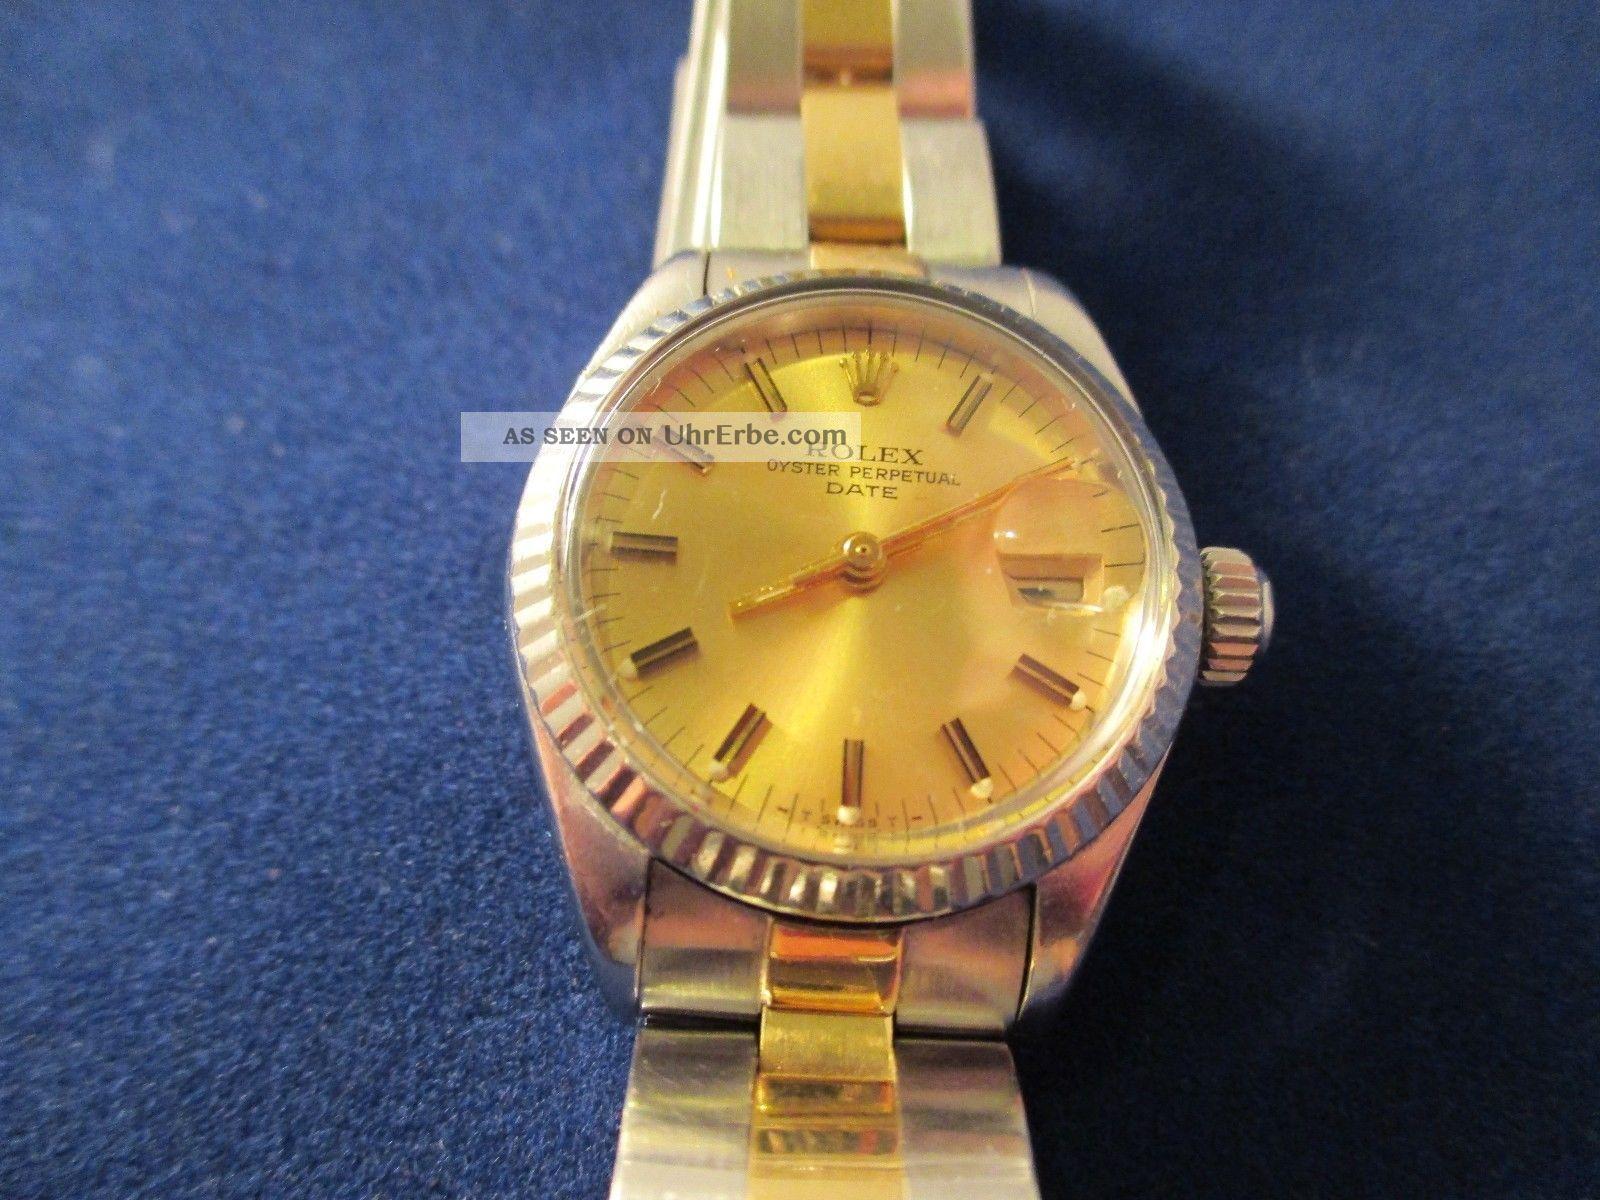 Rolex Orginal Oyster Perpetual Date Damenuhr Stahl/gold Armbanduhren Bild